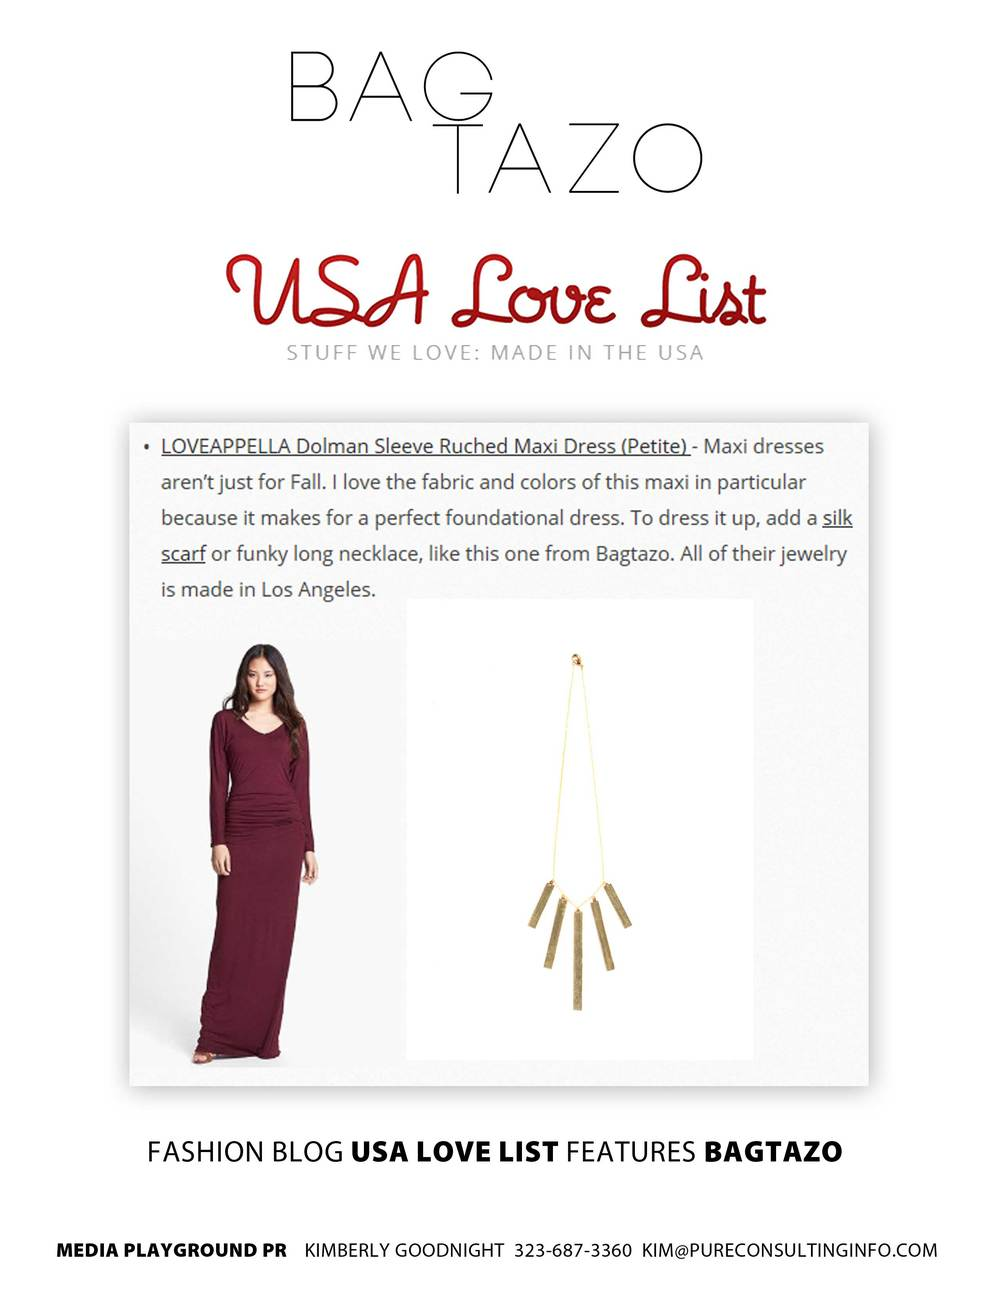 Bagtazo-USA-Love-List.jpg